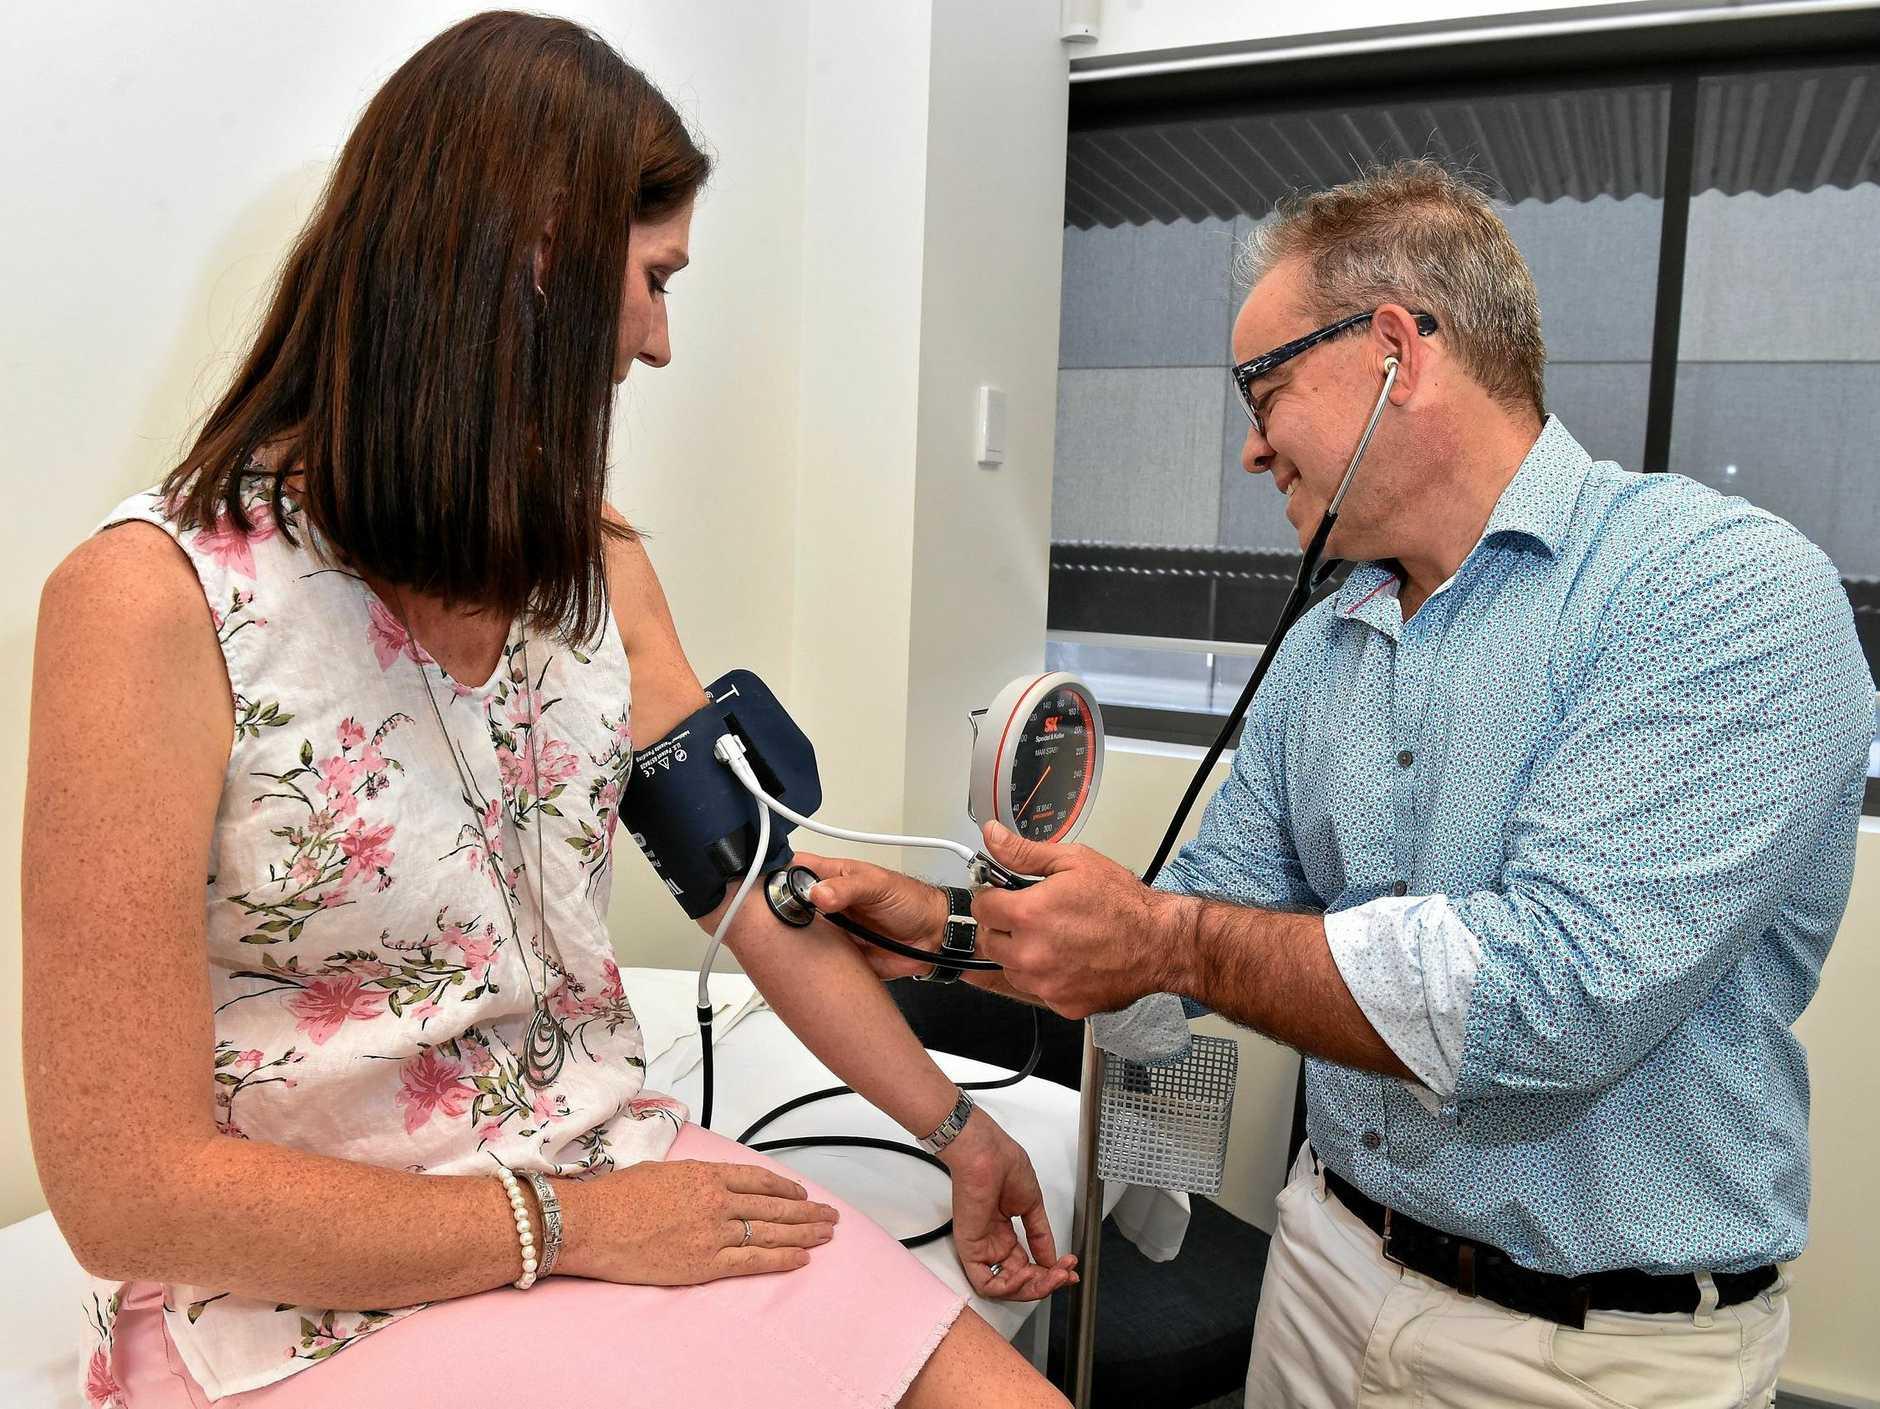 Dr. George Bogiatzis from Sunshine Obstetrics checks the blood pressure of expectant mum Chanelle Shephard.